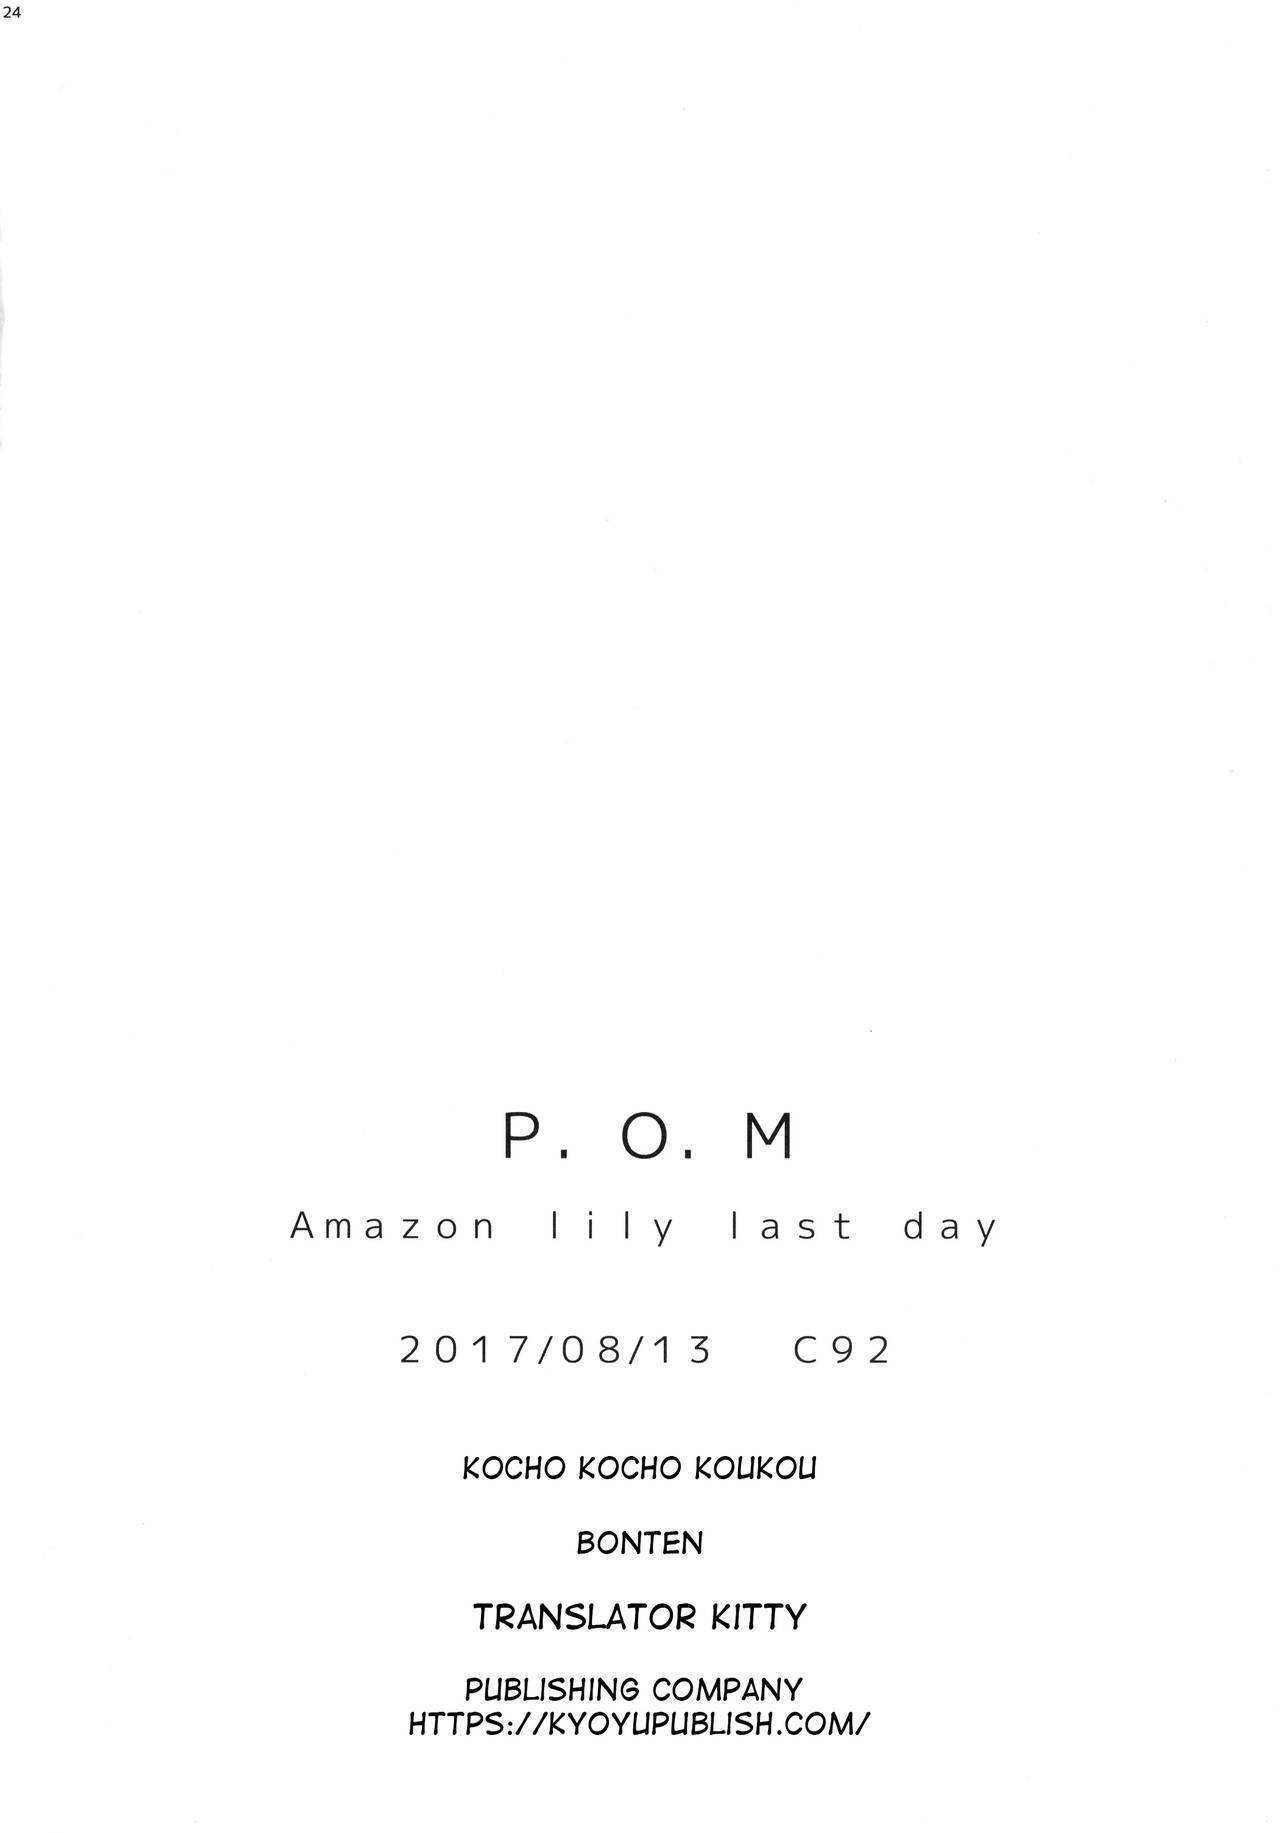 P.O.M Amazon lily last day 26